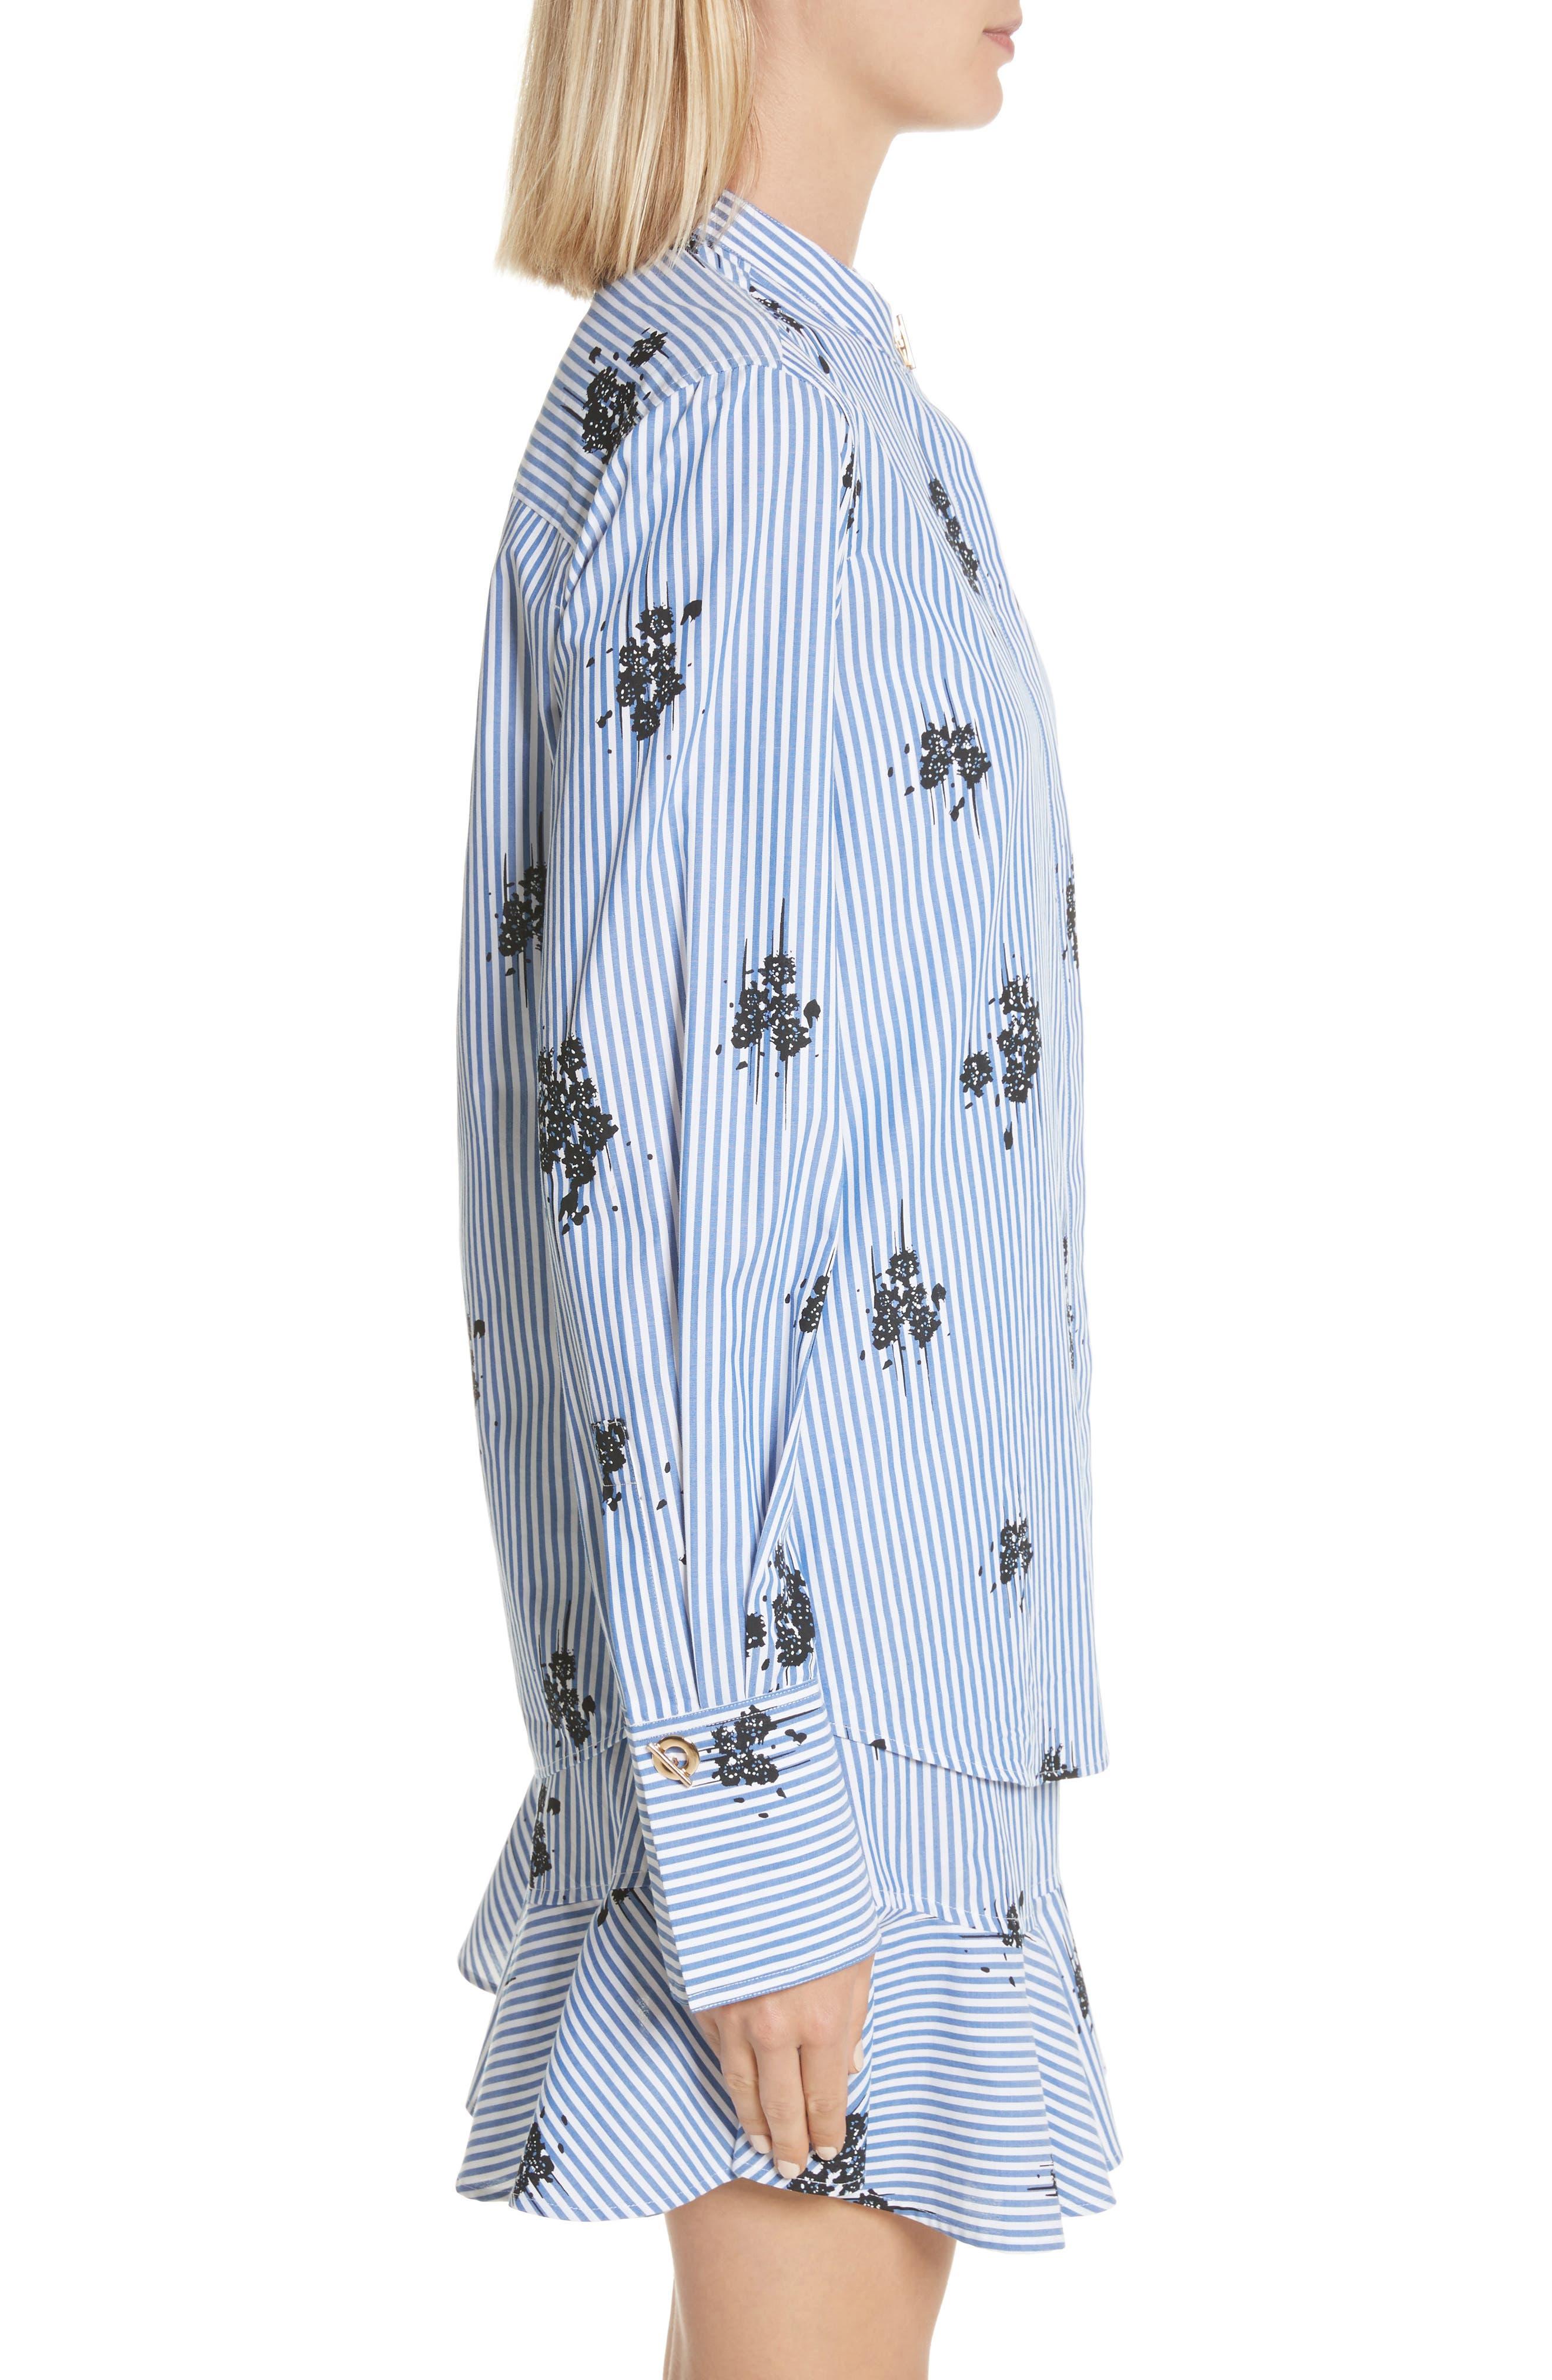 2-in-1 Ruffled Shirtdress,                             Alternate thumbnail 4, color,                             Blue